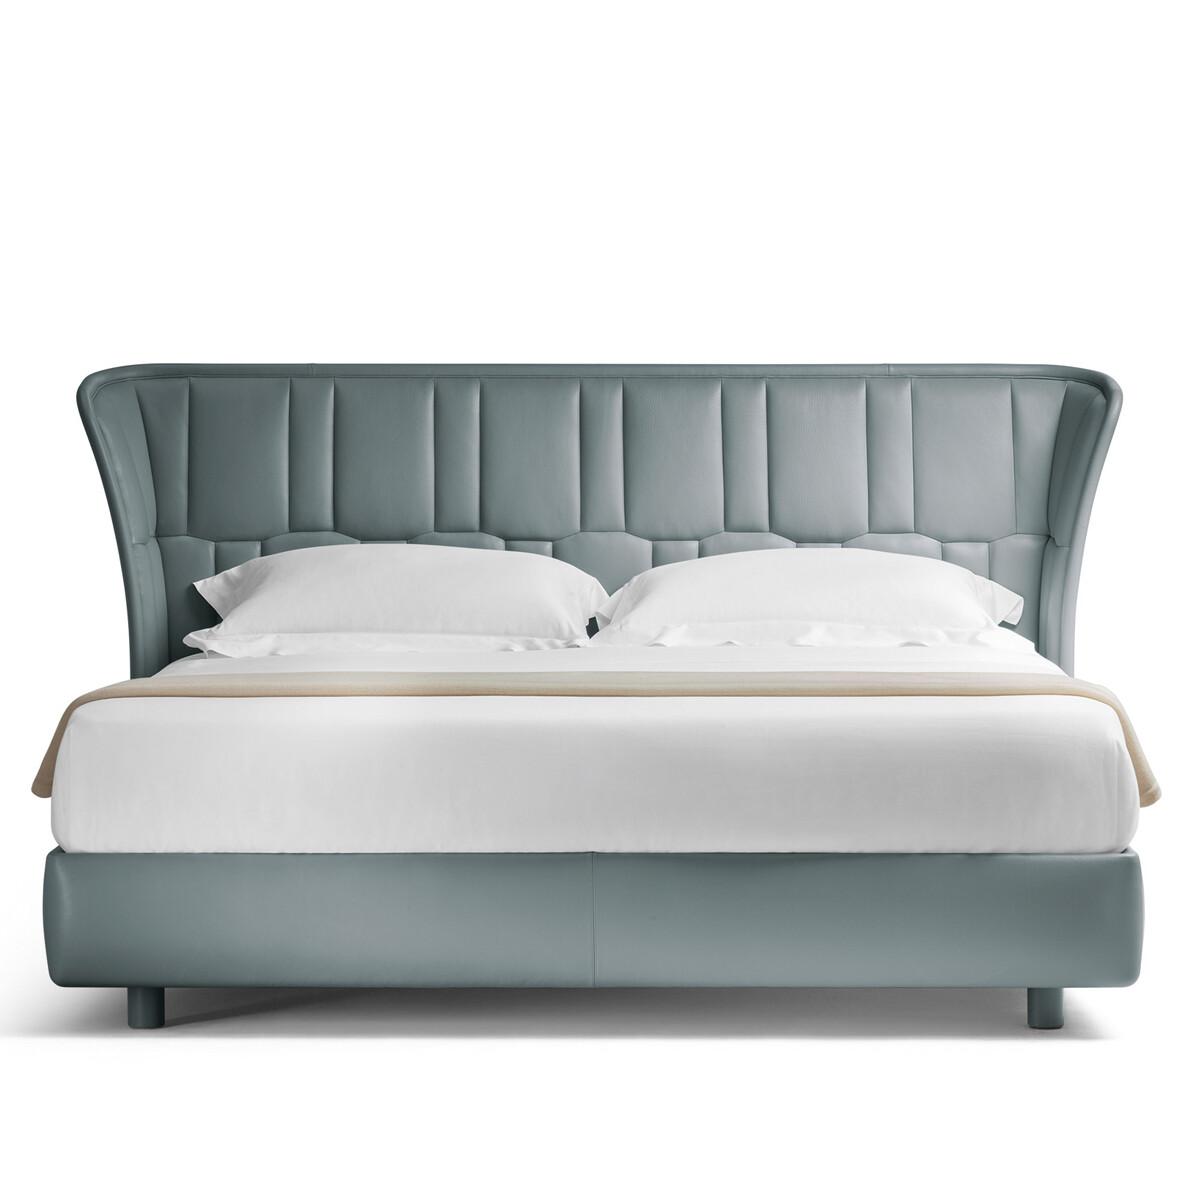 Poltrona Frau LOLA DARLING Bett | CASA.DE